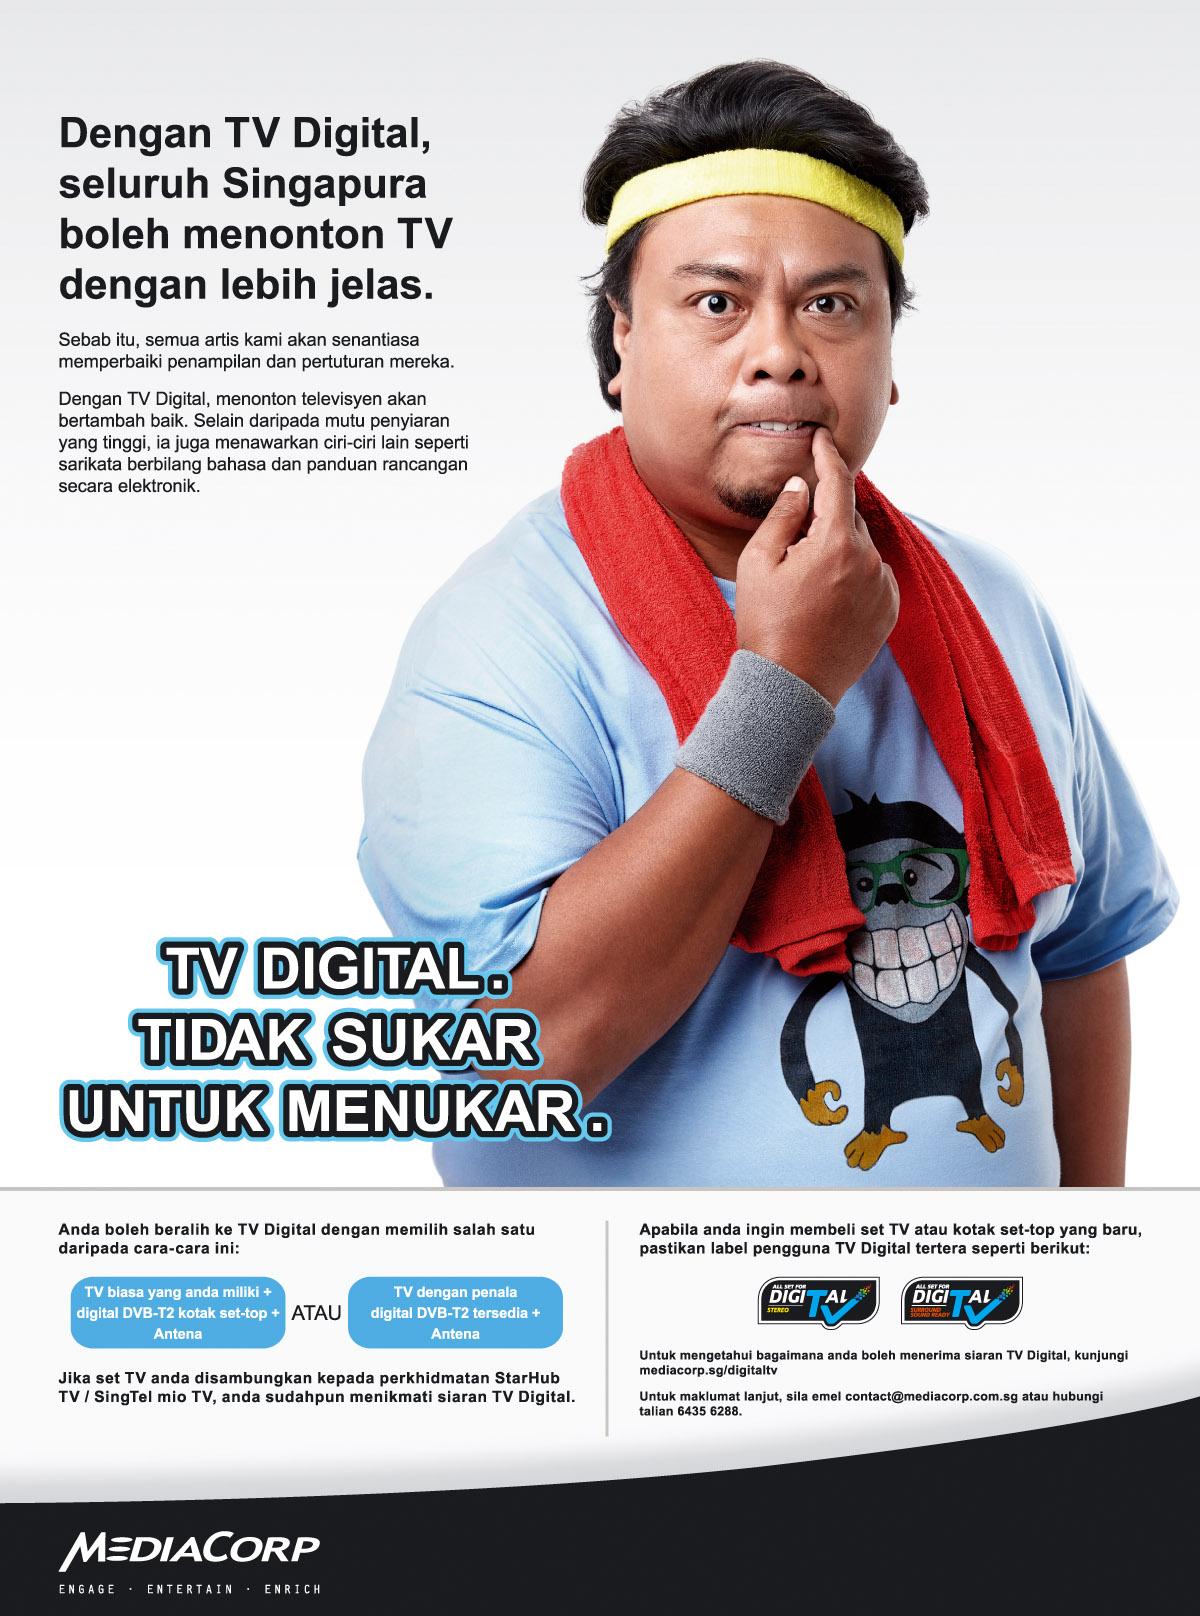 MediaCorp_Digital TV_Manja_205x276_Suhaimi_FA13p.ai